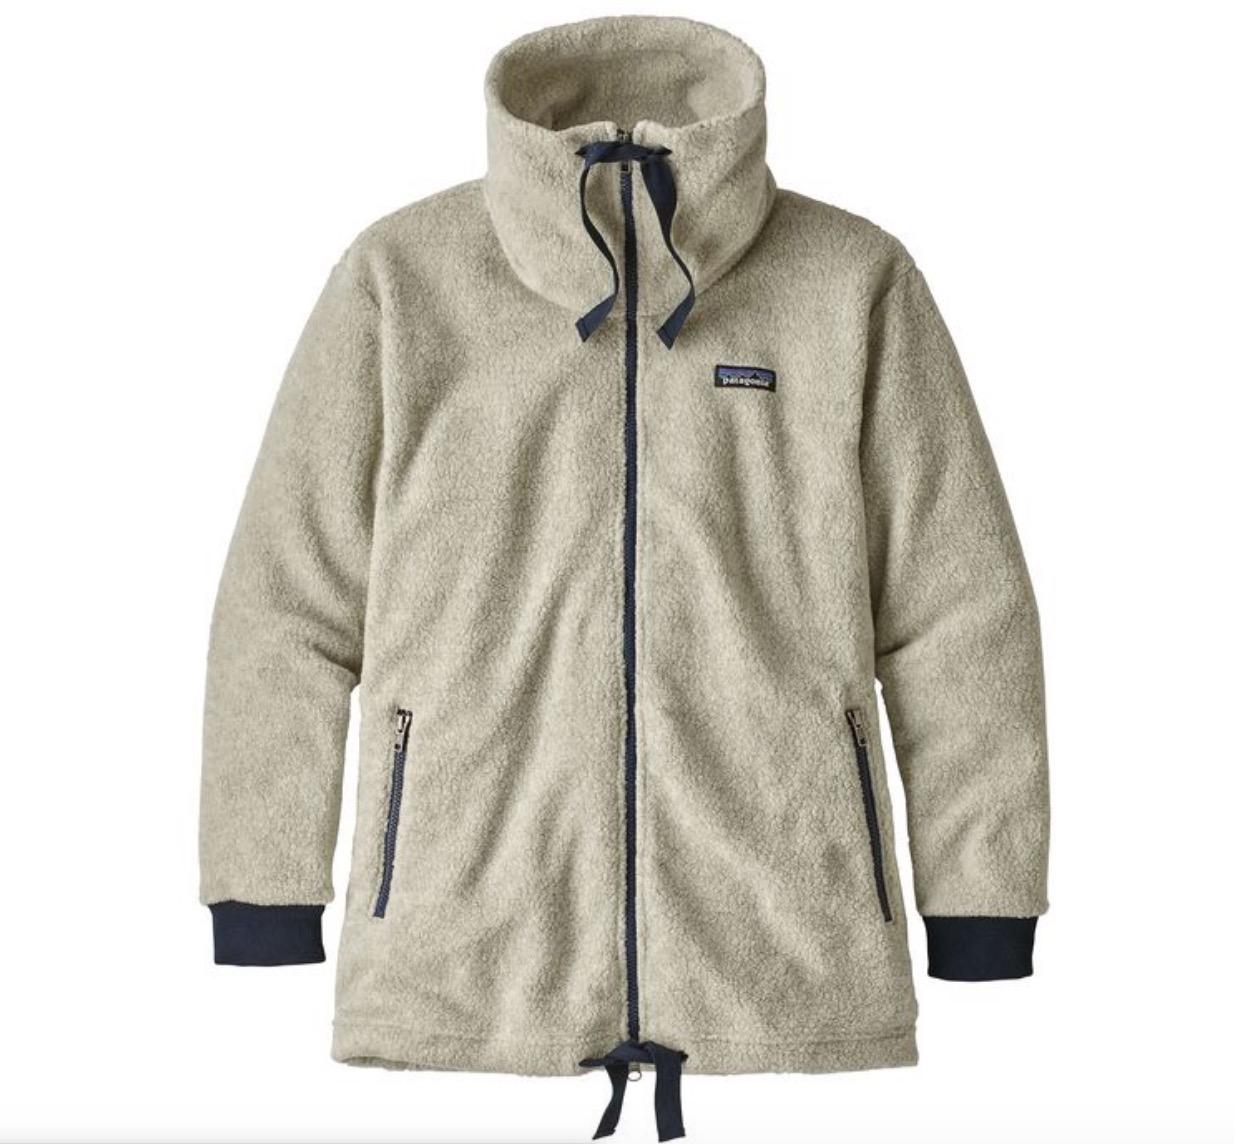 Patagonia Women's Shearling Fleece Jacket